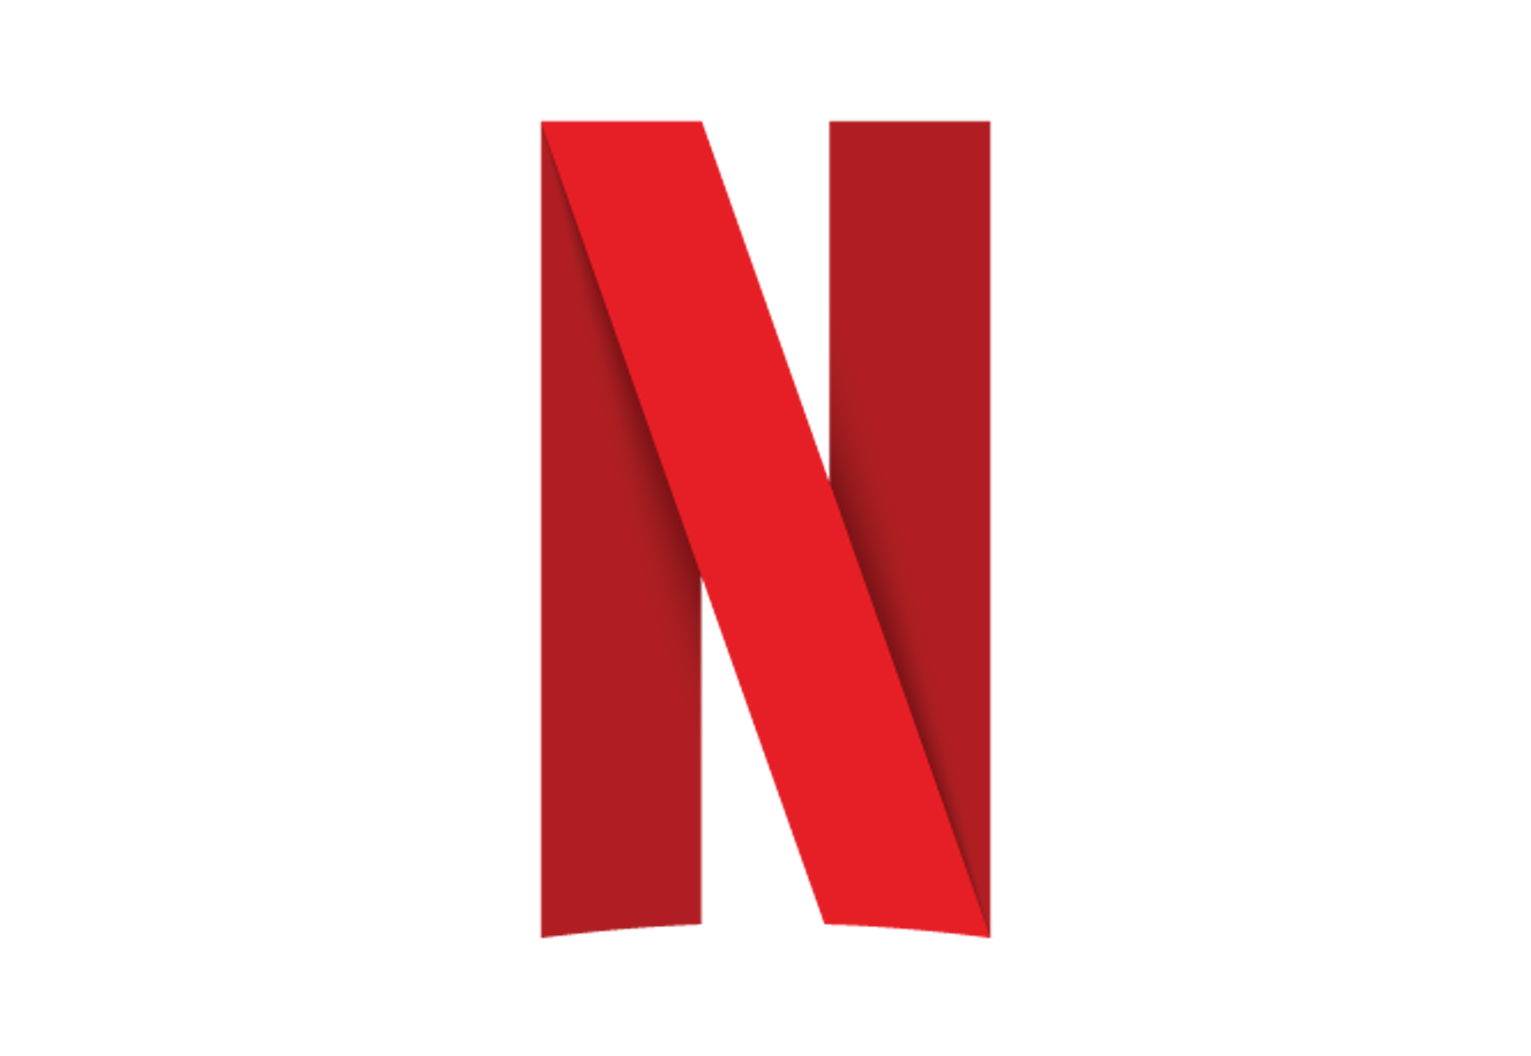 crop-612-422-1531-1056-0-Netflix_N_logo.png